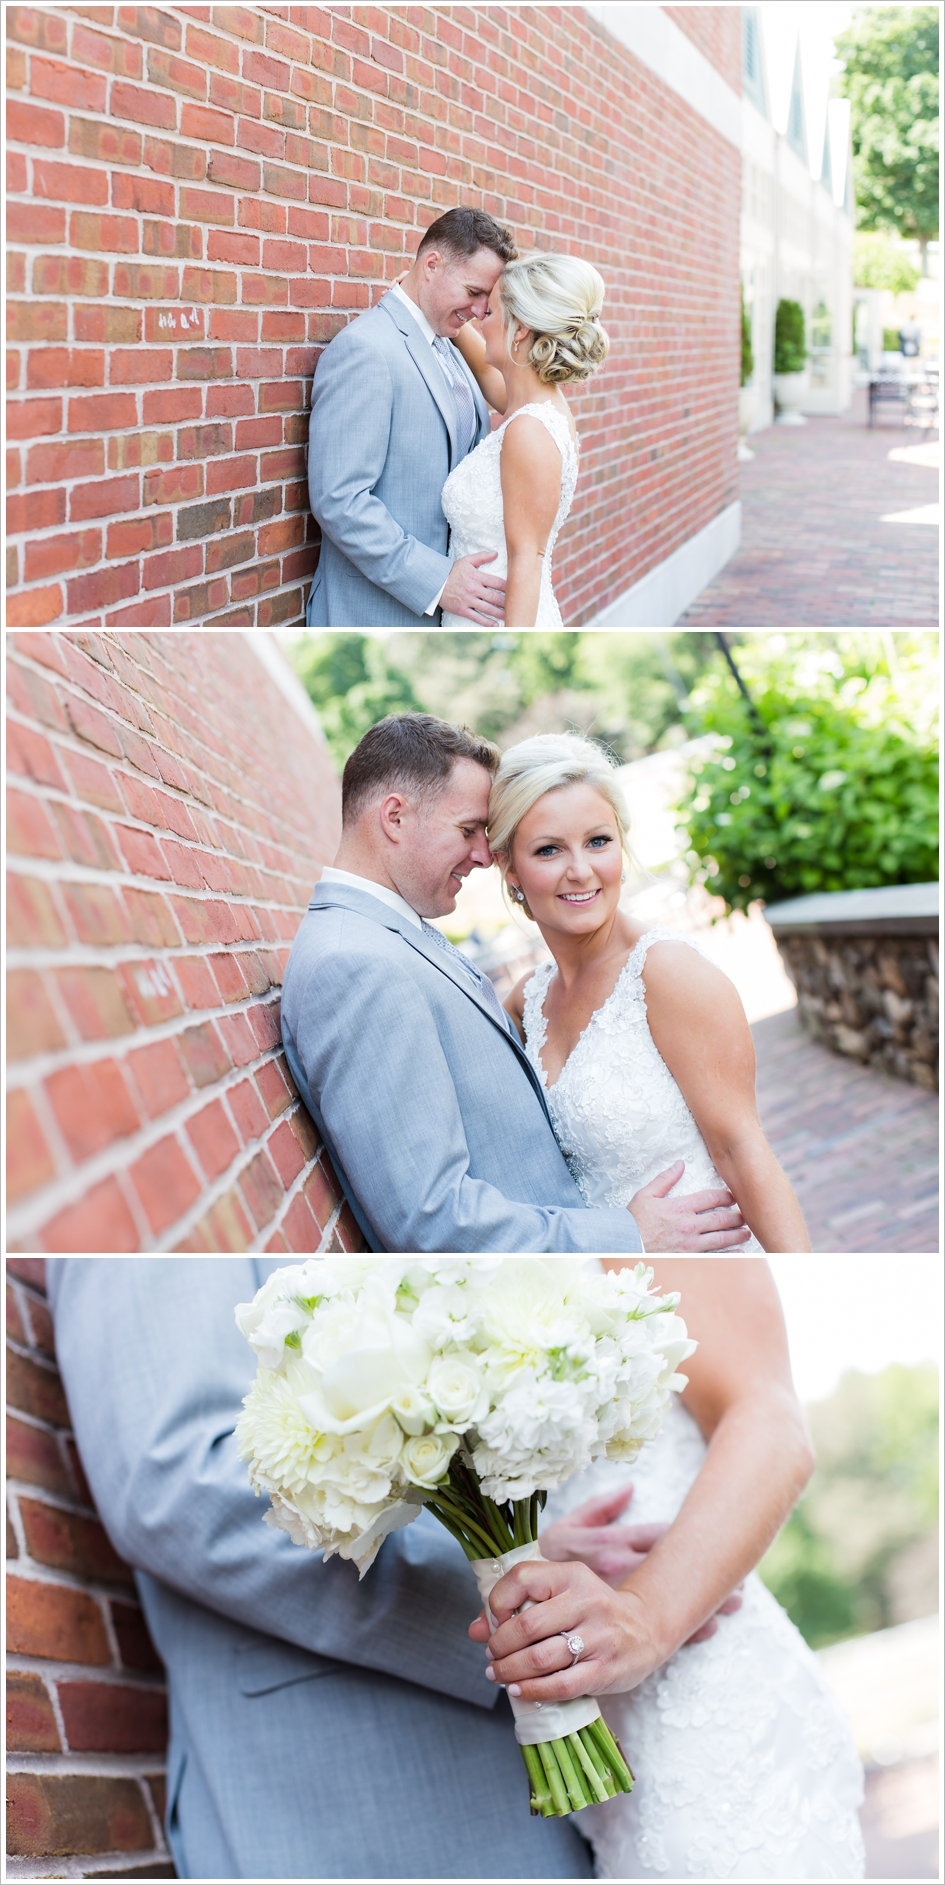 Bride Groom Portrait Photography Boston, Worcester, MA Beechwood Hotel Photos